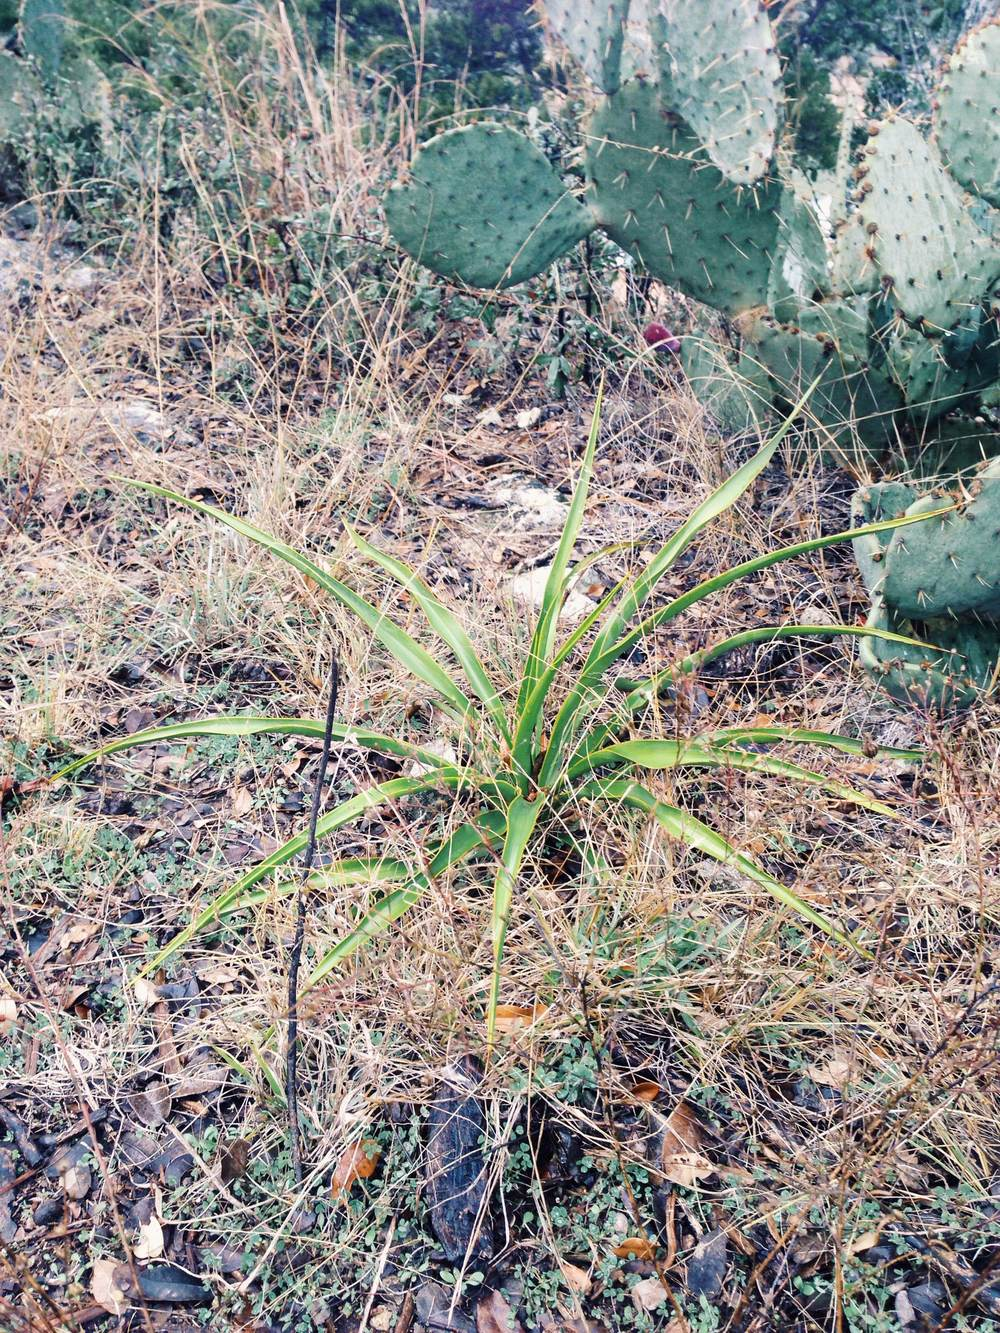 Plant: Yucca rupicola, Twistleaf Yucca | Locations: Double Eagle Ranch, Burnet Co., Texas